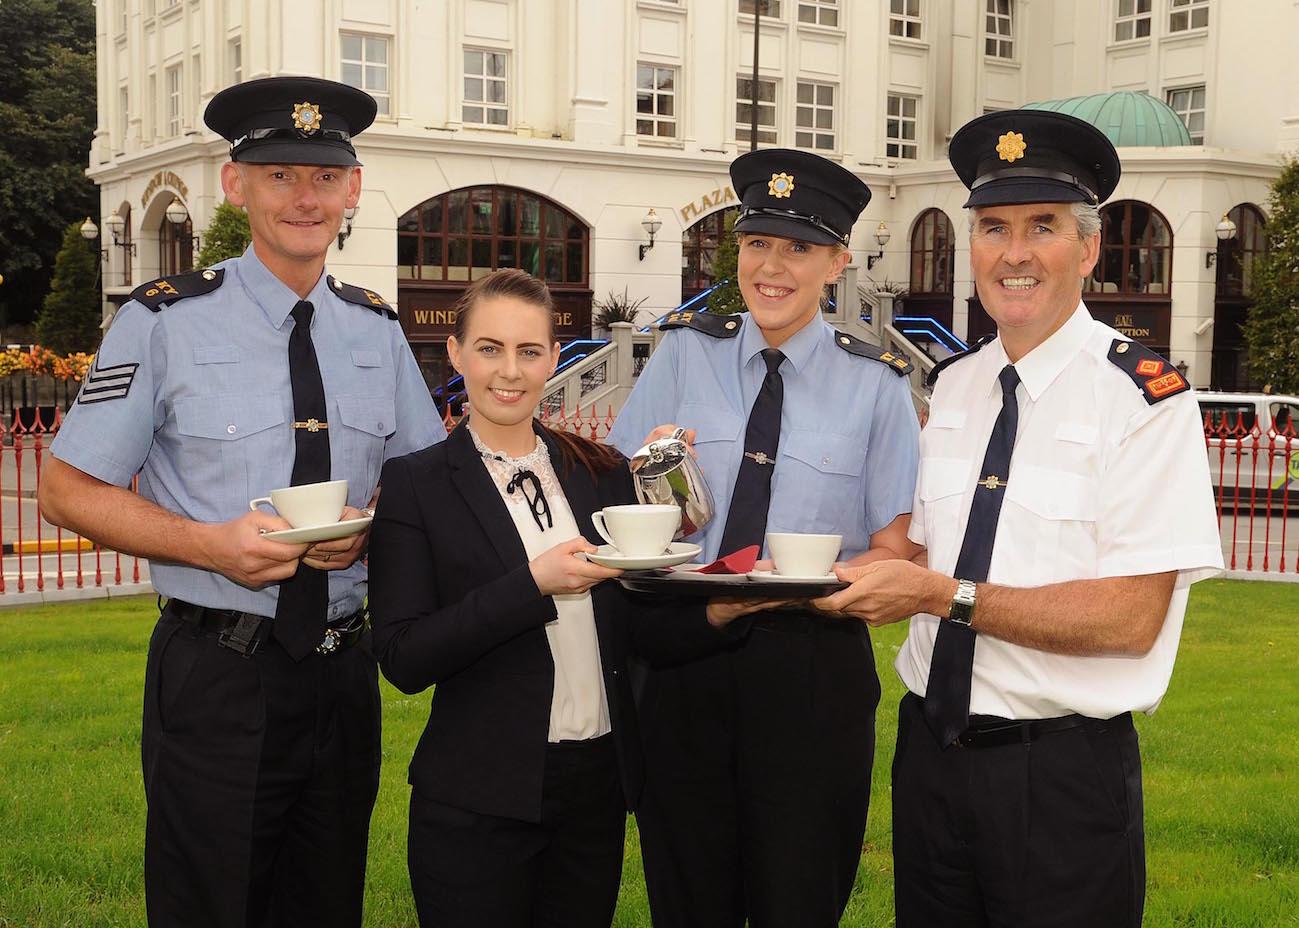 Sgt Dermot O'Connell, Garda Gillian MacEoin and Superintendent Flor Murphy with Orla O'Driscoll, Killarney Plaza Hotel, launching the Garda Coffee morning at The Killarney Plaza Hotel. PICTURE: EAMONN KEOGH